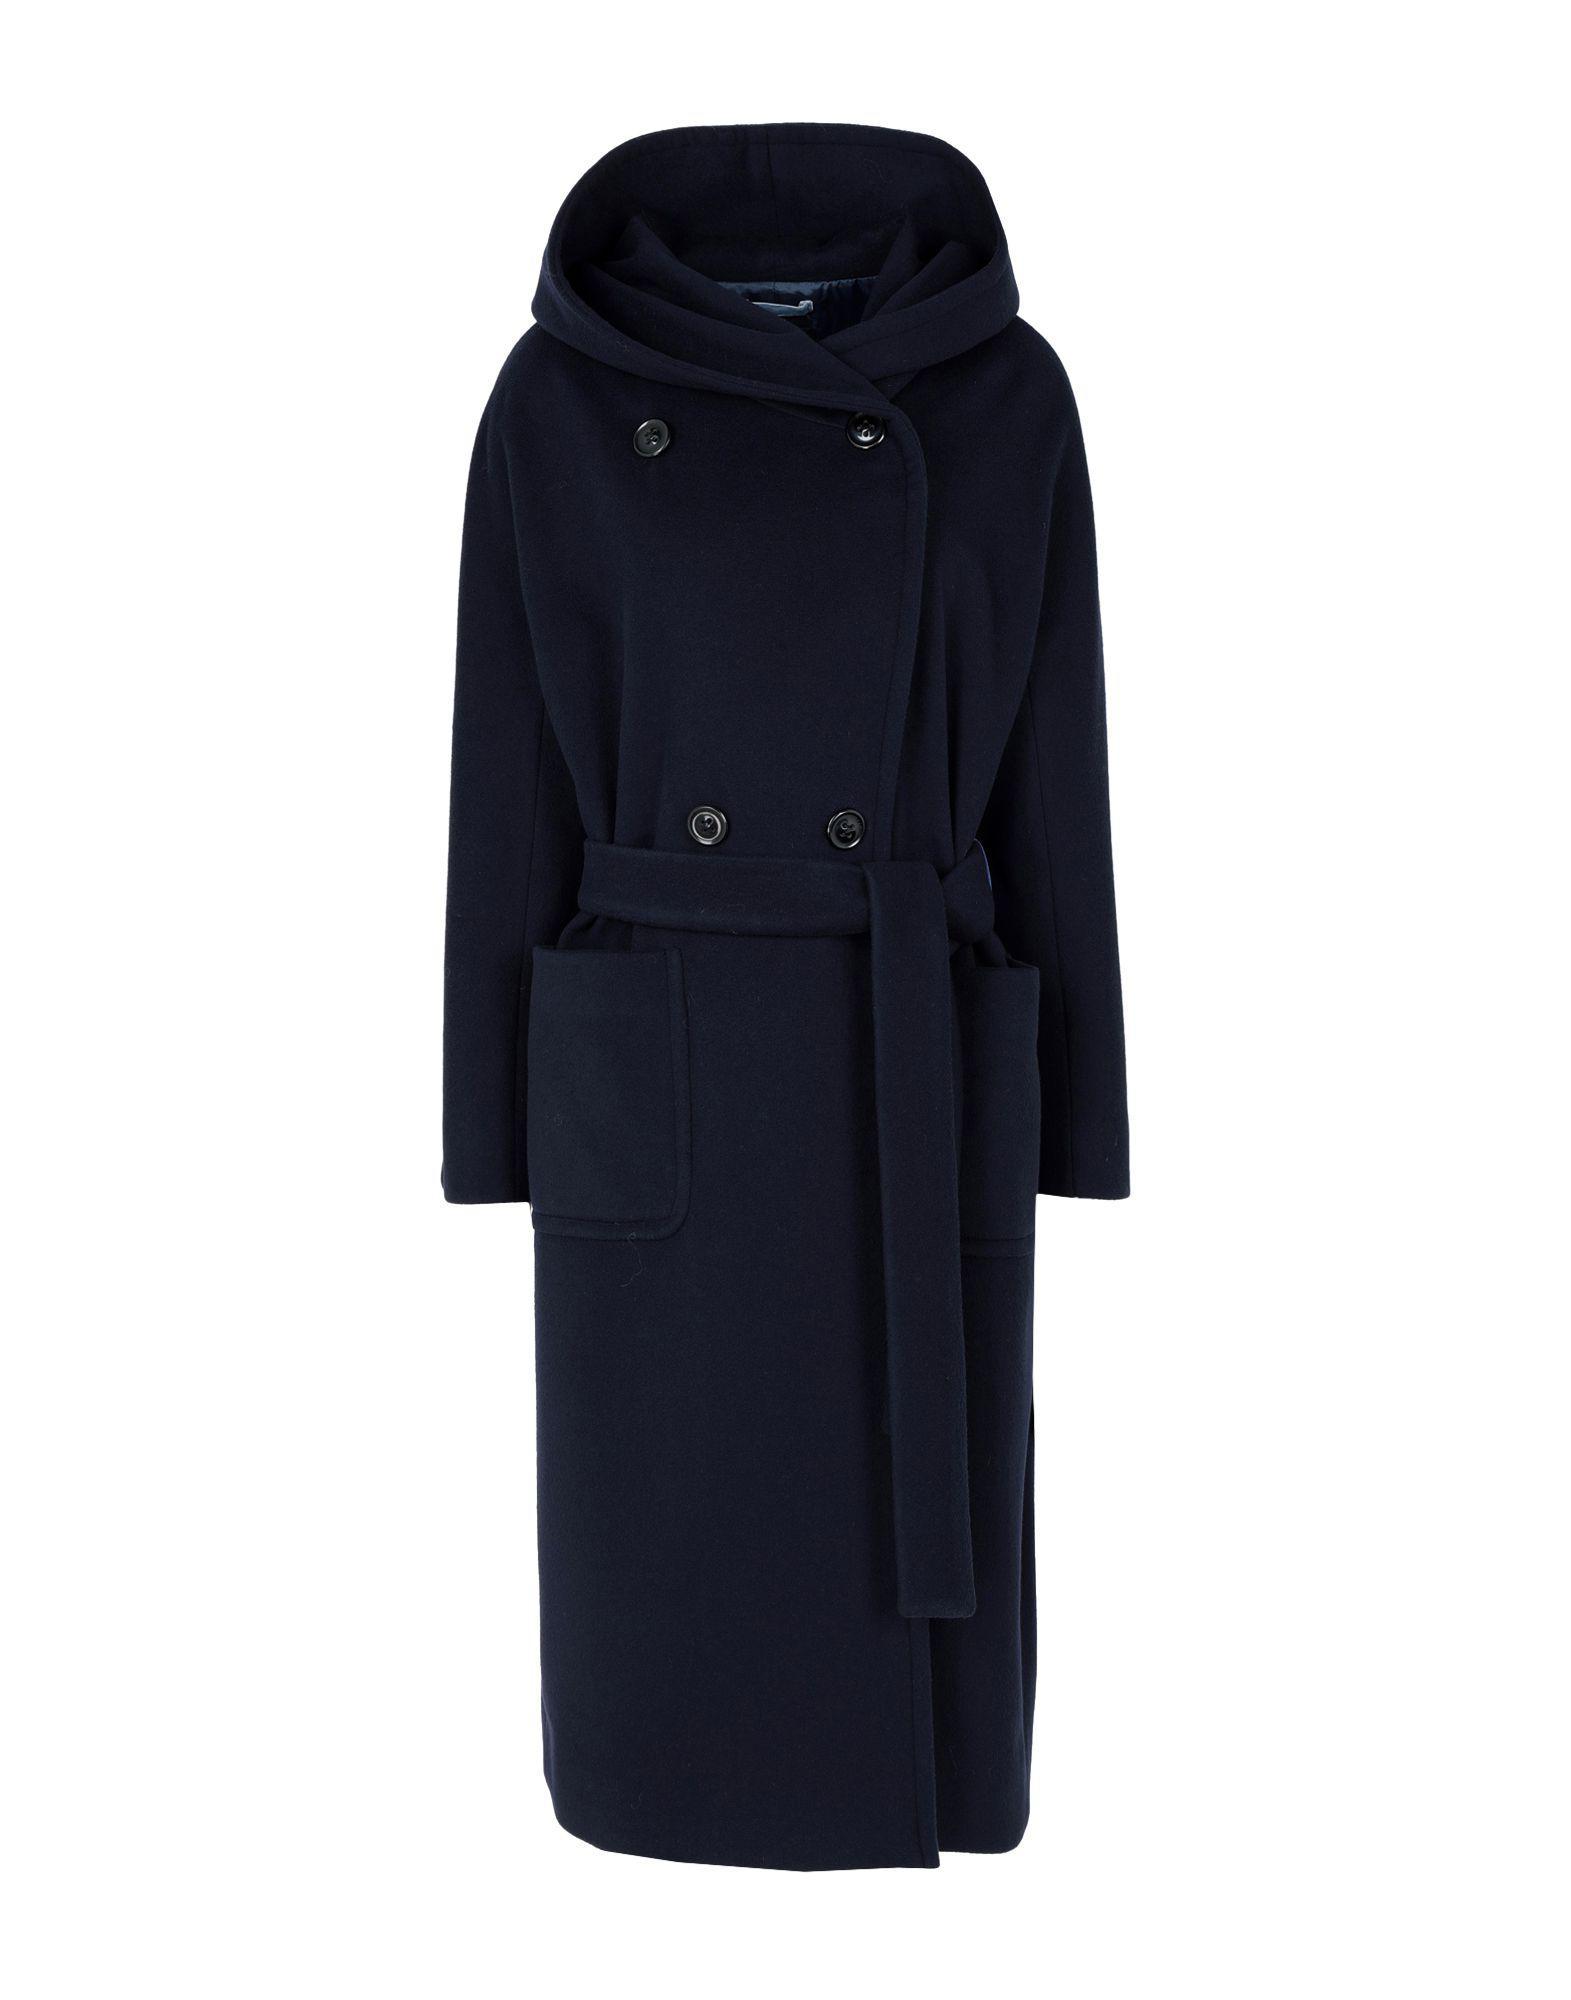 8d17defba0c4 Lyst - Paltò Coat in Blue